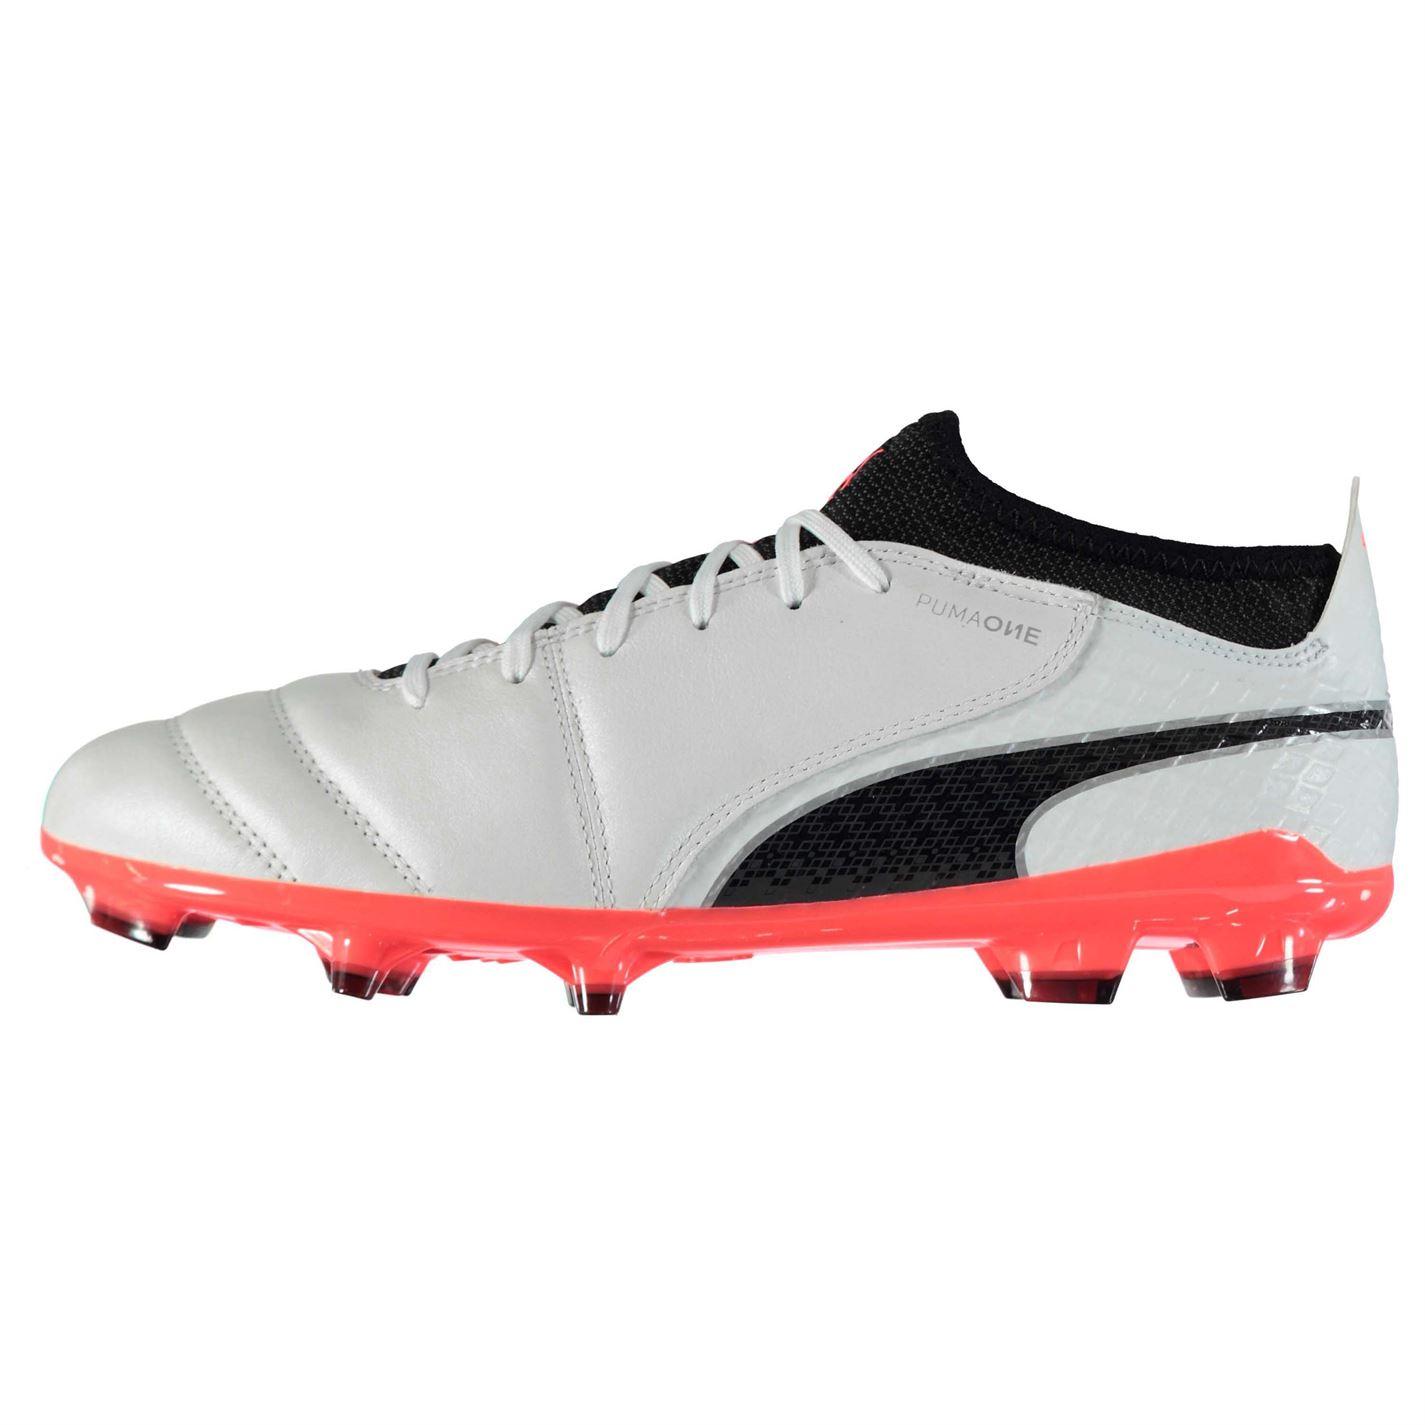 Puma One 17.2 FG Mens Football Boots